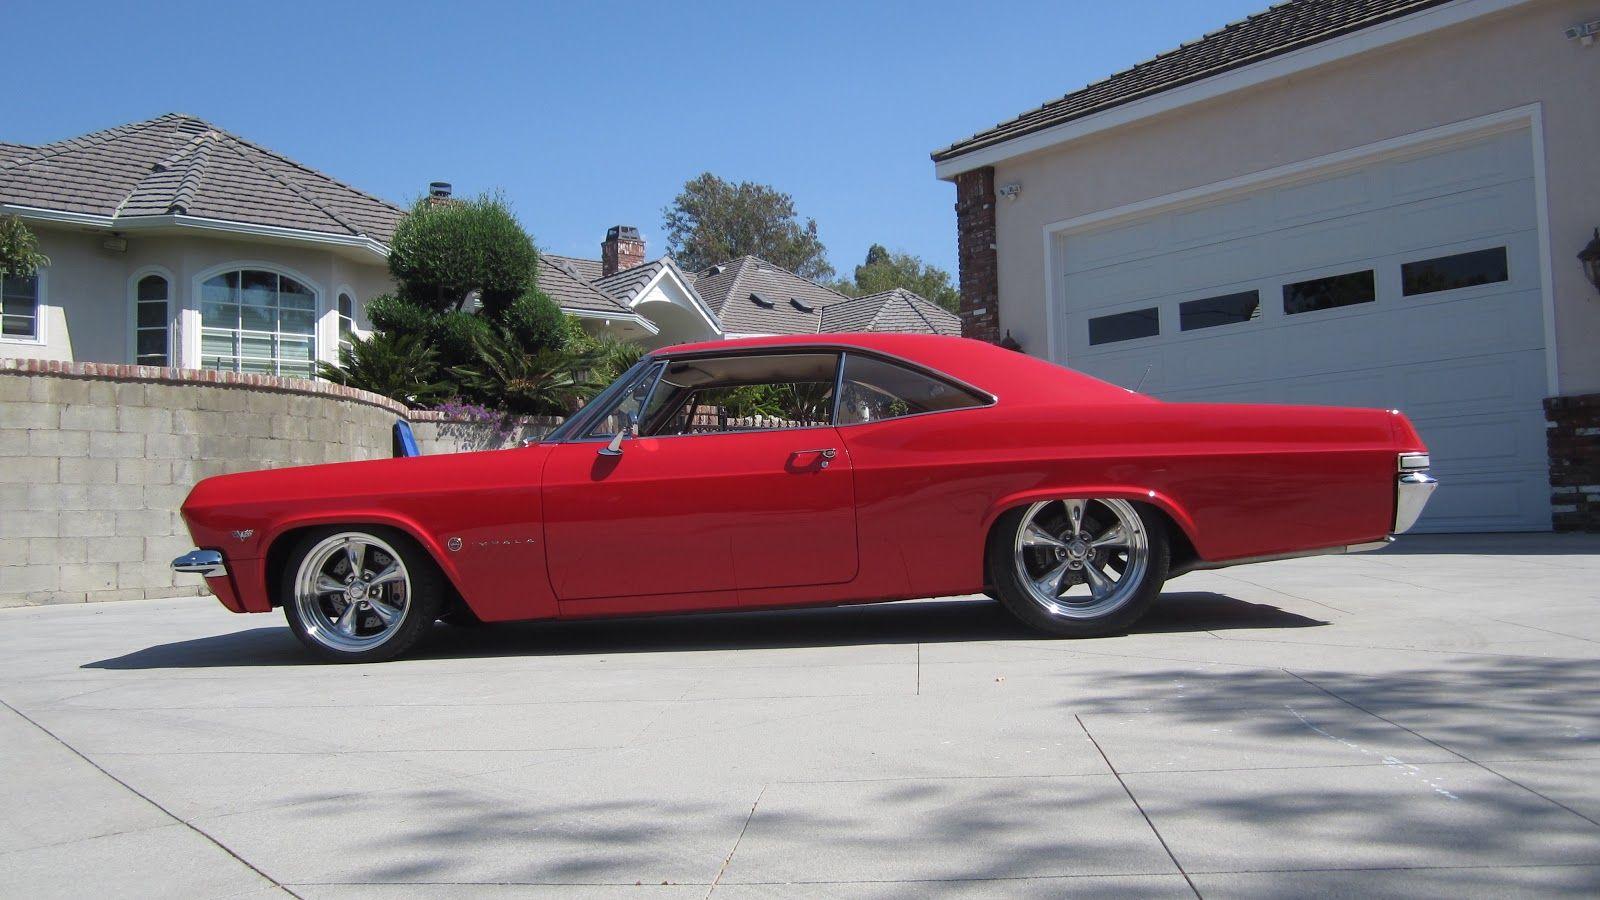 1965 impala tops in fastback design art on wheels cars pinterest impalas chevrolet impala and chevrolet